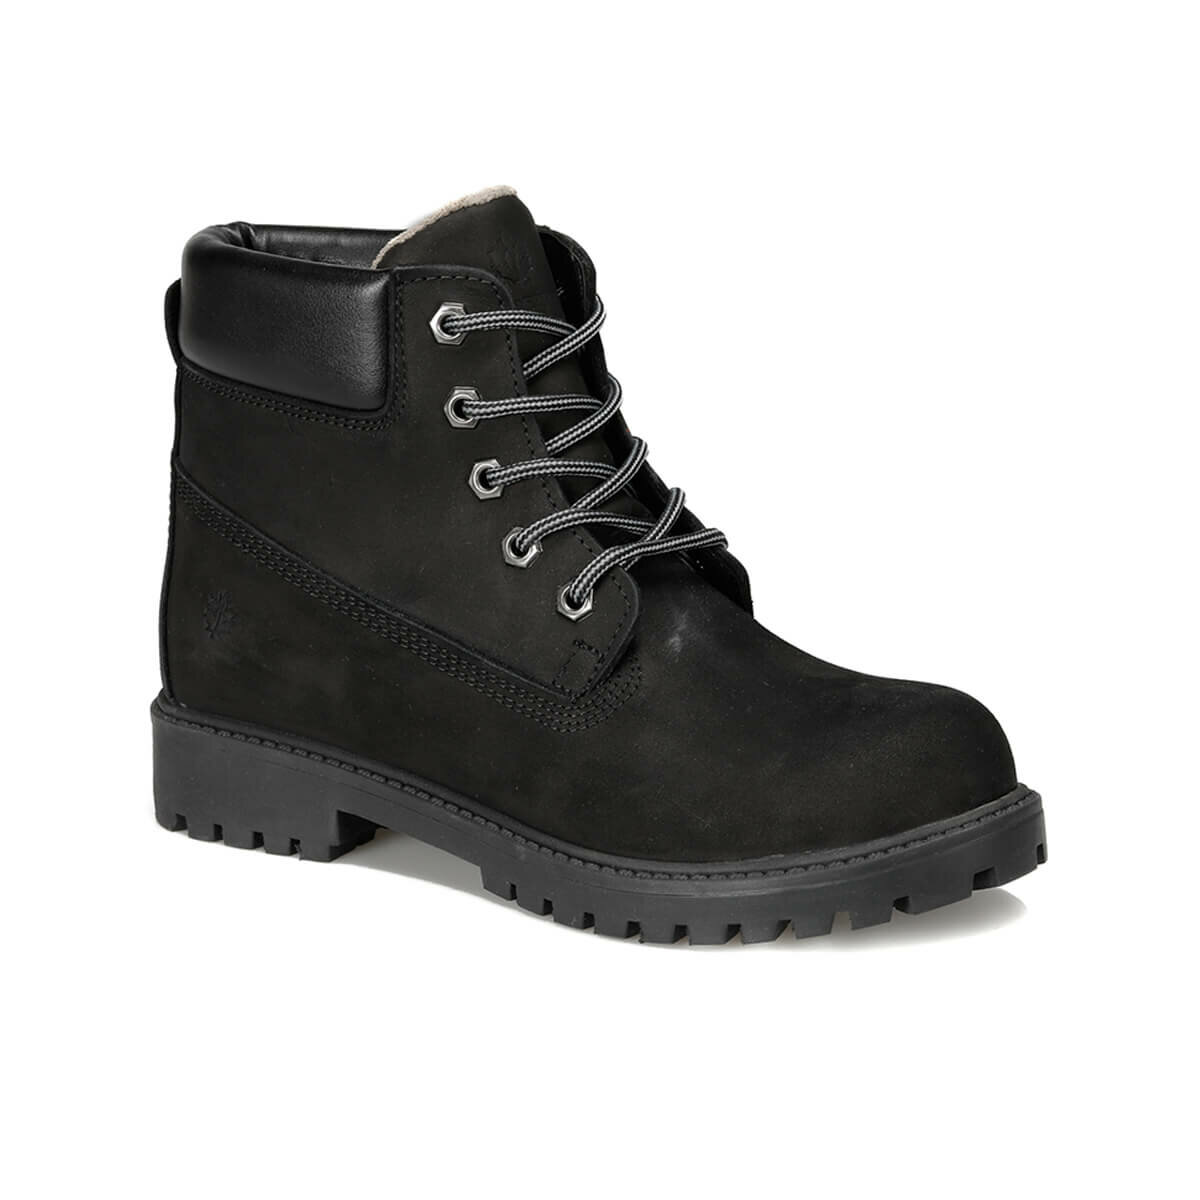 FLO ROANA 9PR Black Male Child Hiking Shoes LUMBERJACK